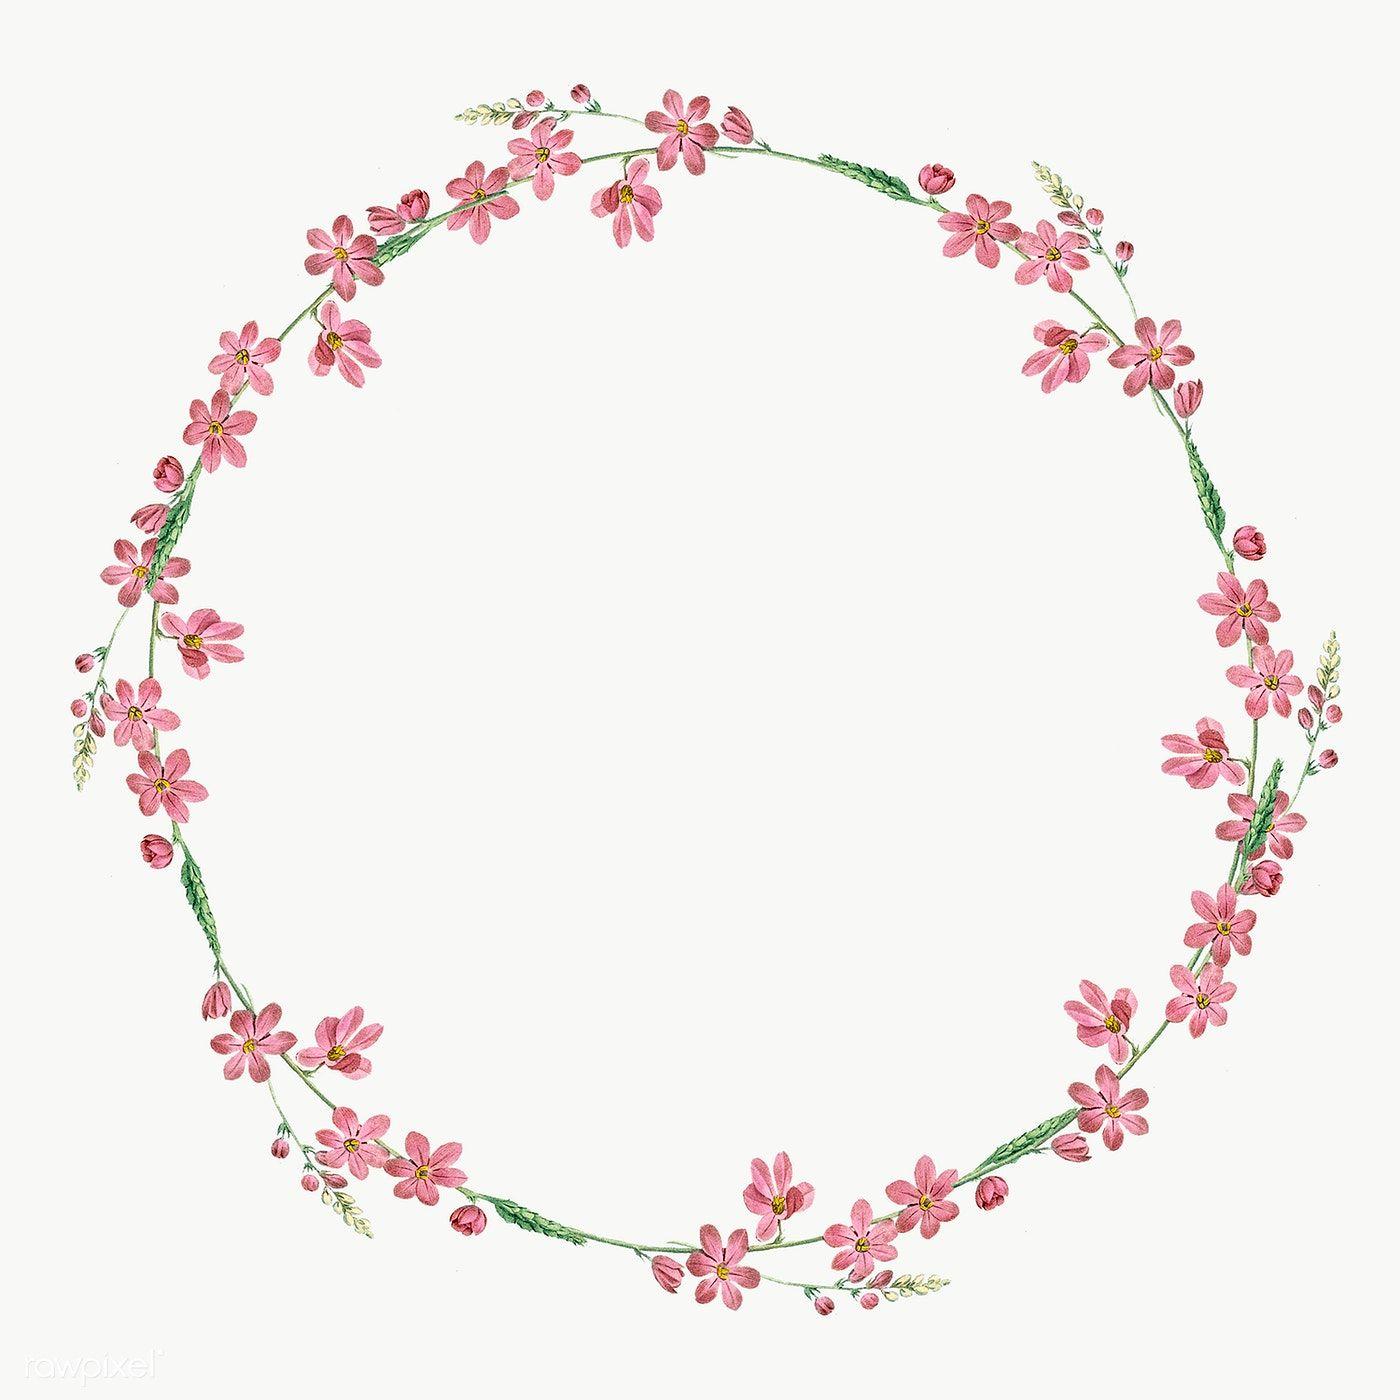 Round Mixed Flowers Frame Patterned Transparent Png Premium Image By Rawpixel Com Kappy Kappy Floral Border Design Flower Frame Floral Logo